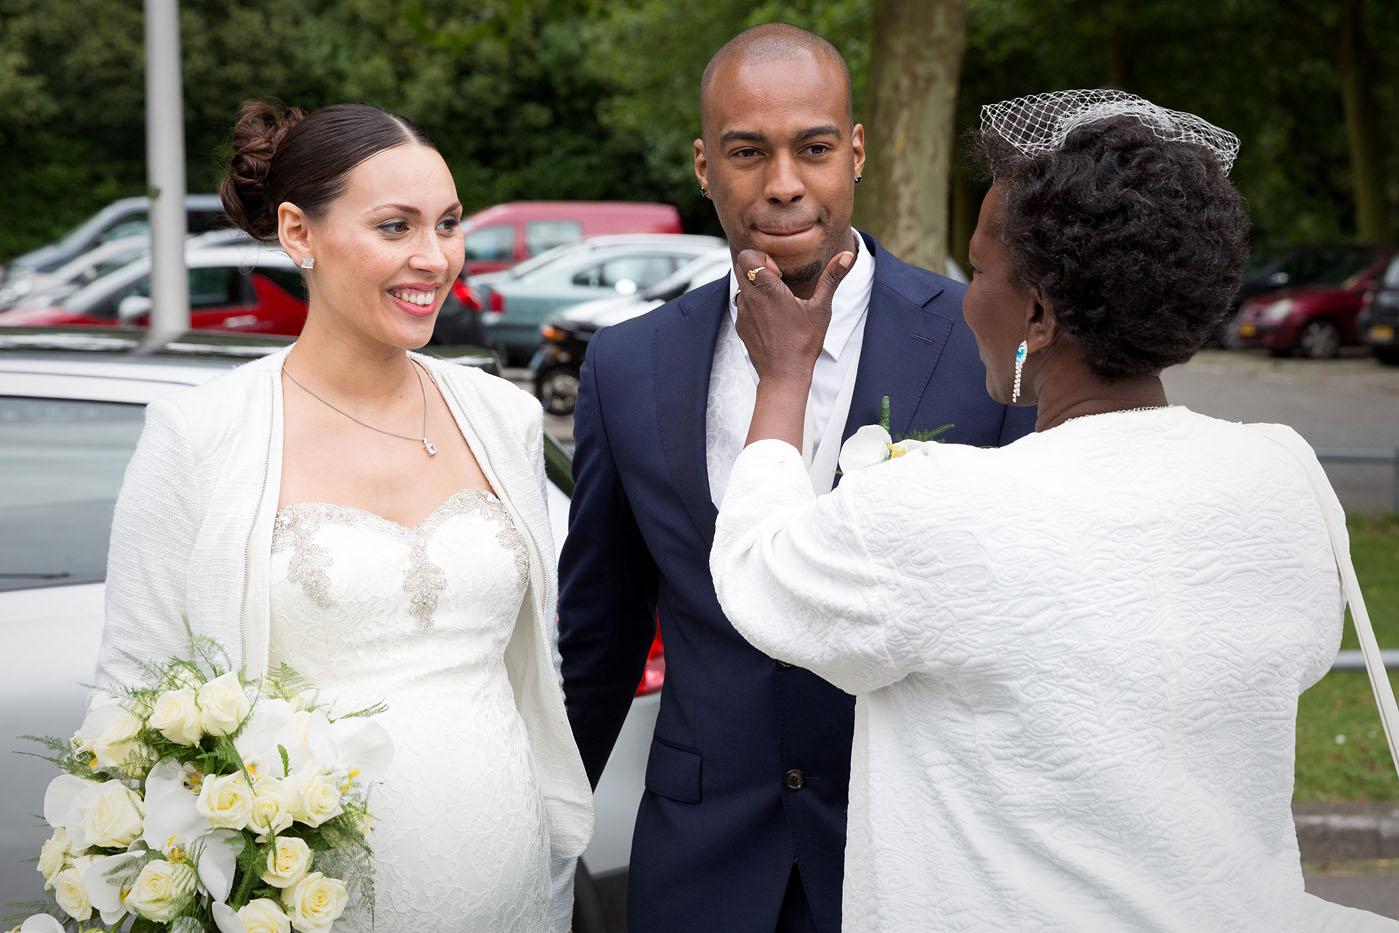 bruiloft-wedding-trouwen-rotterdam-fotograaf-bobhersbach-moeder